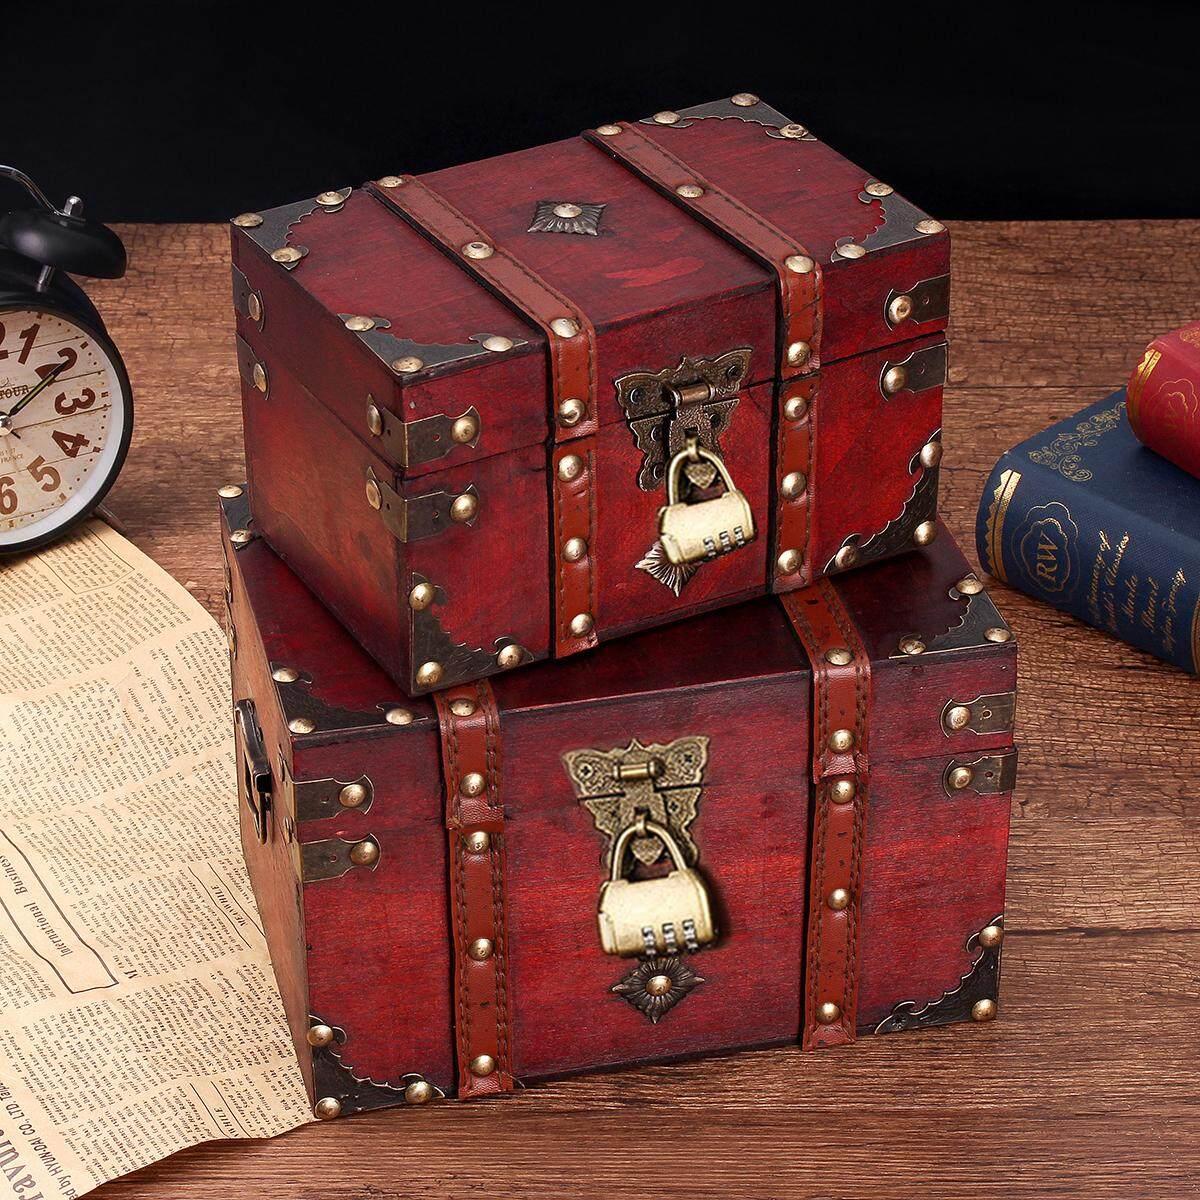 S/L Sizes Vintage Wooden Storage Box Jewelry Treasure Pearl Display Organizer Holder With Lock